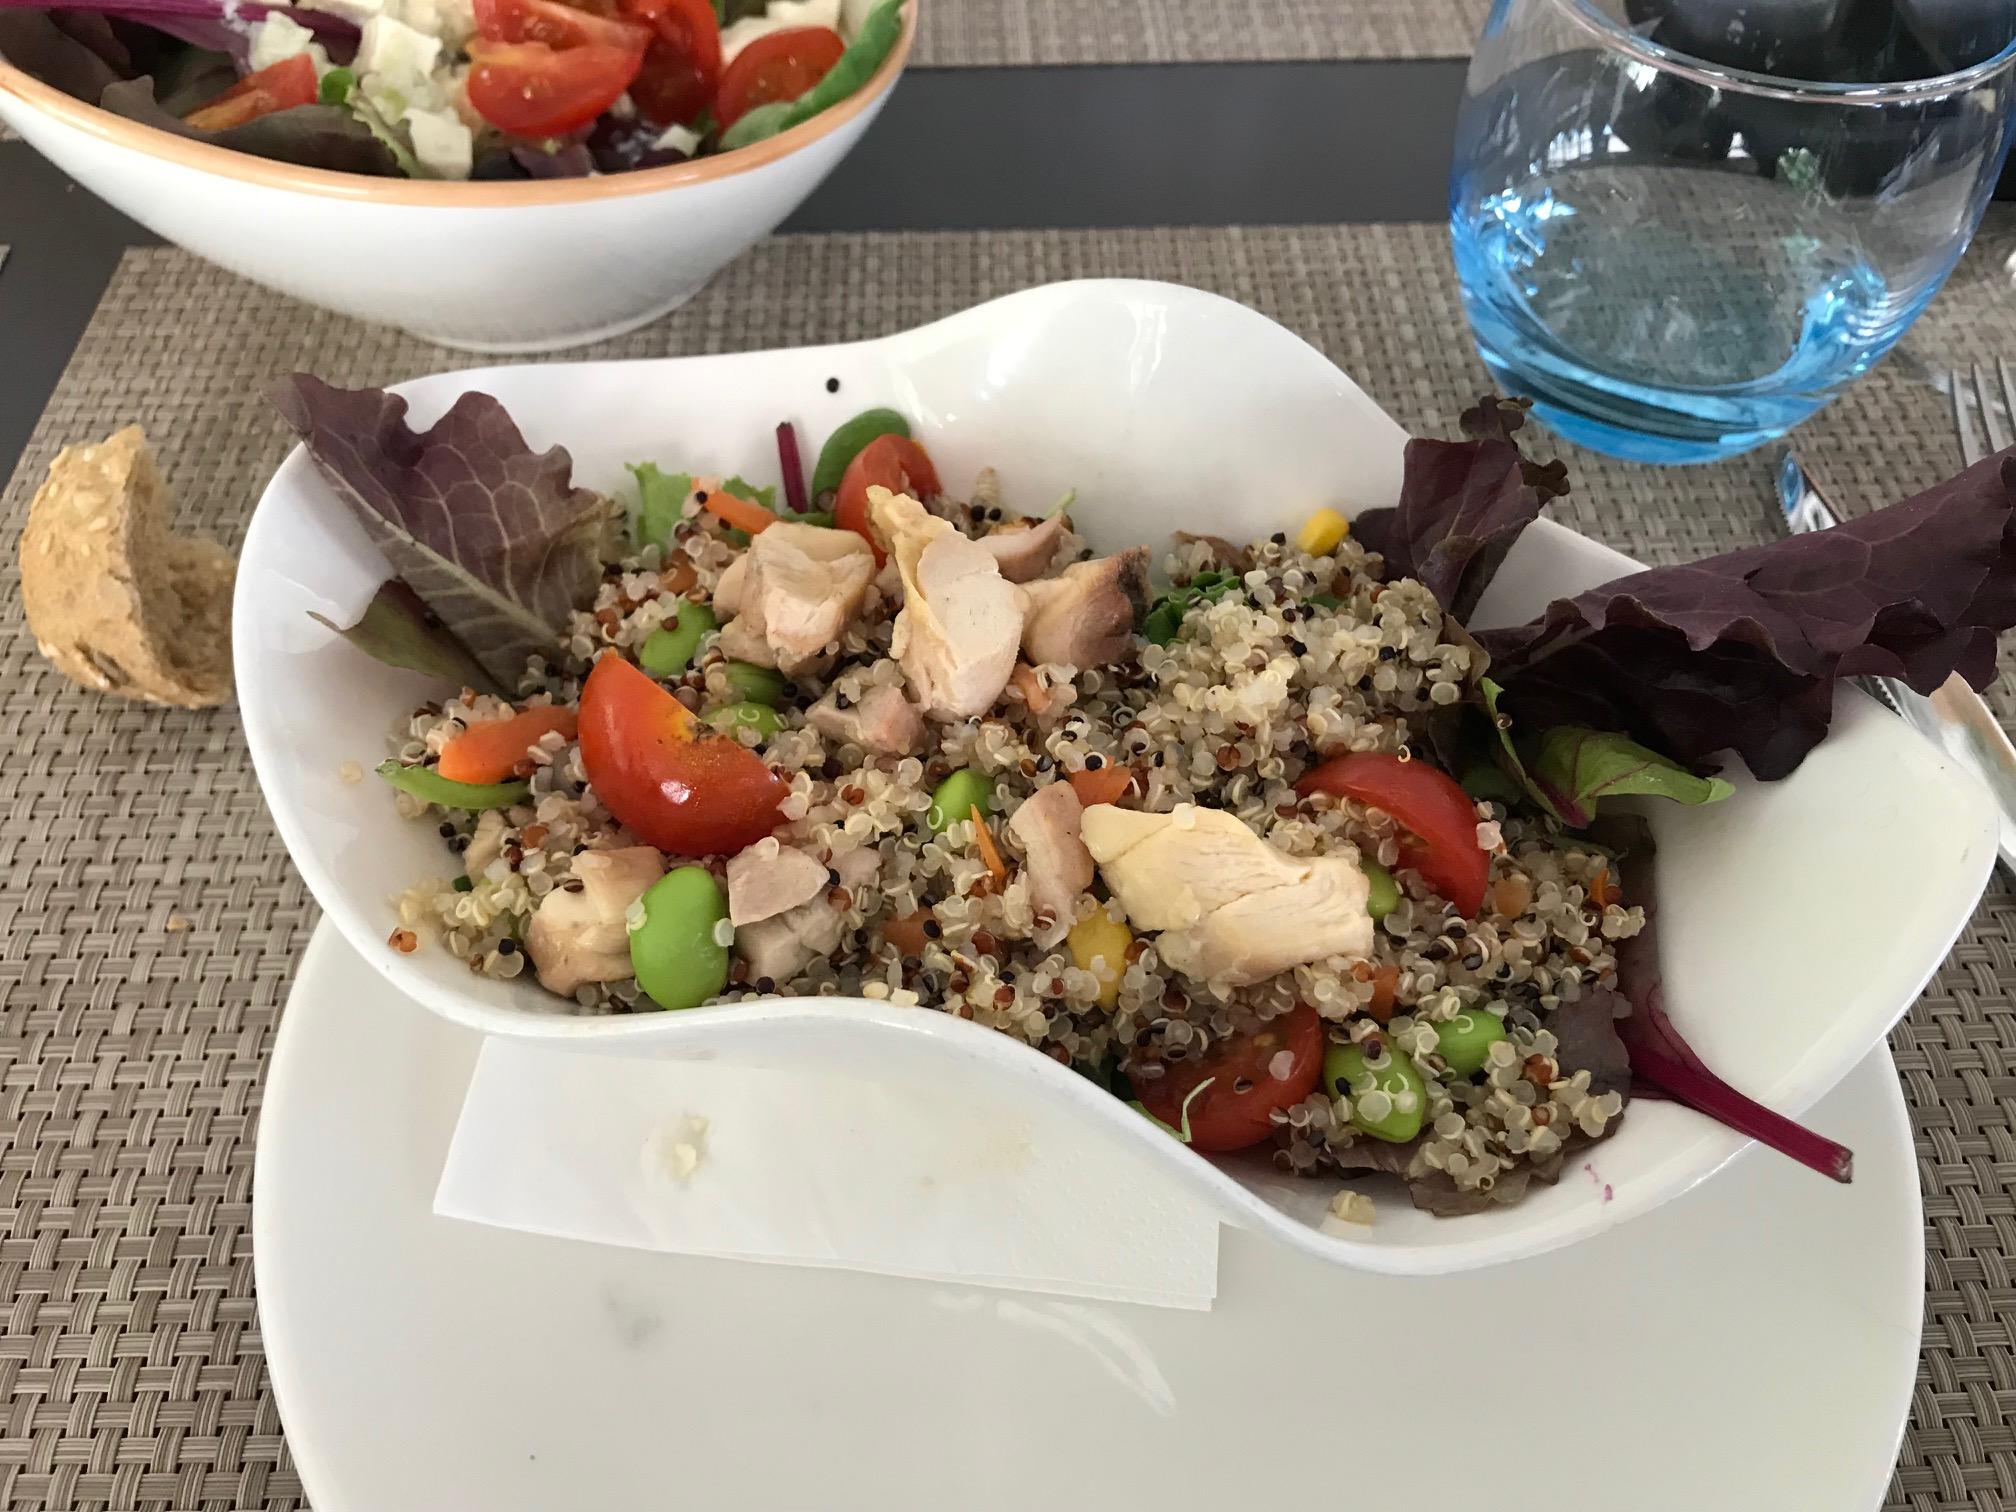 Restaurante en Castelldefels Ensalada de quinoa y pollo.